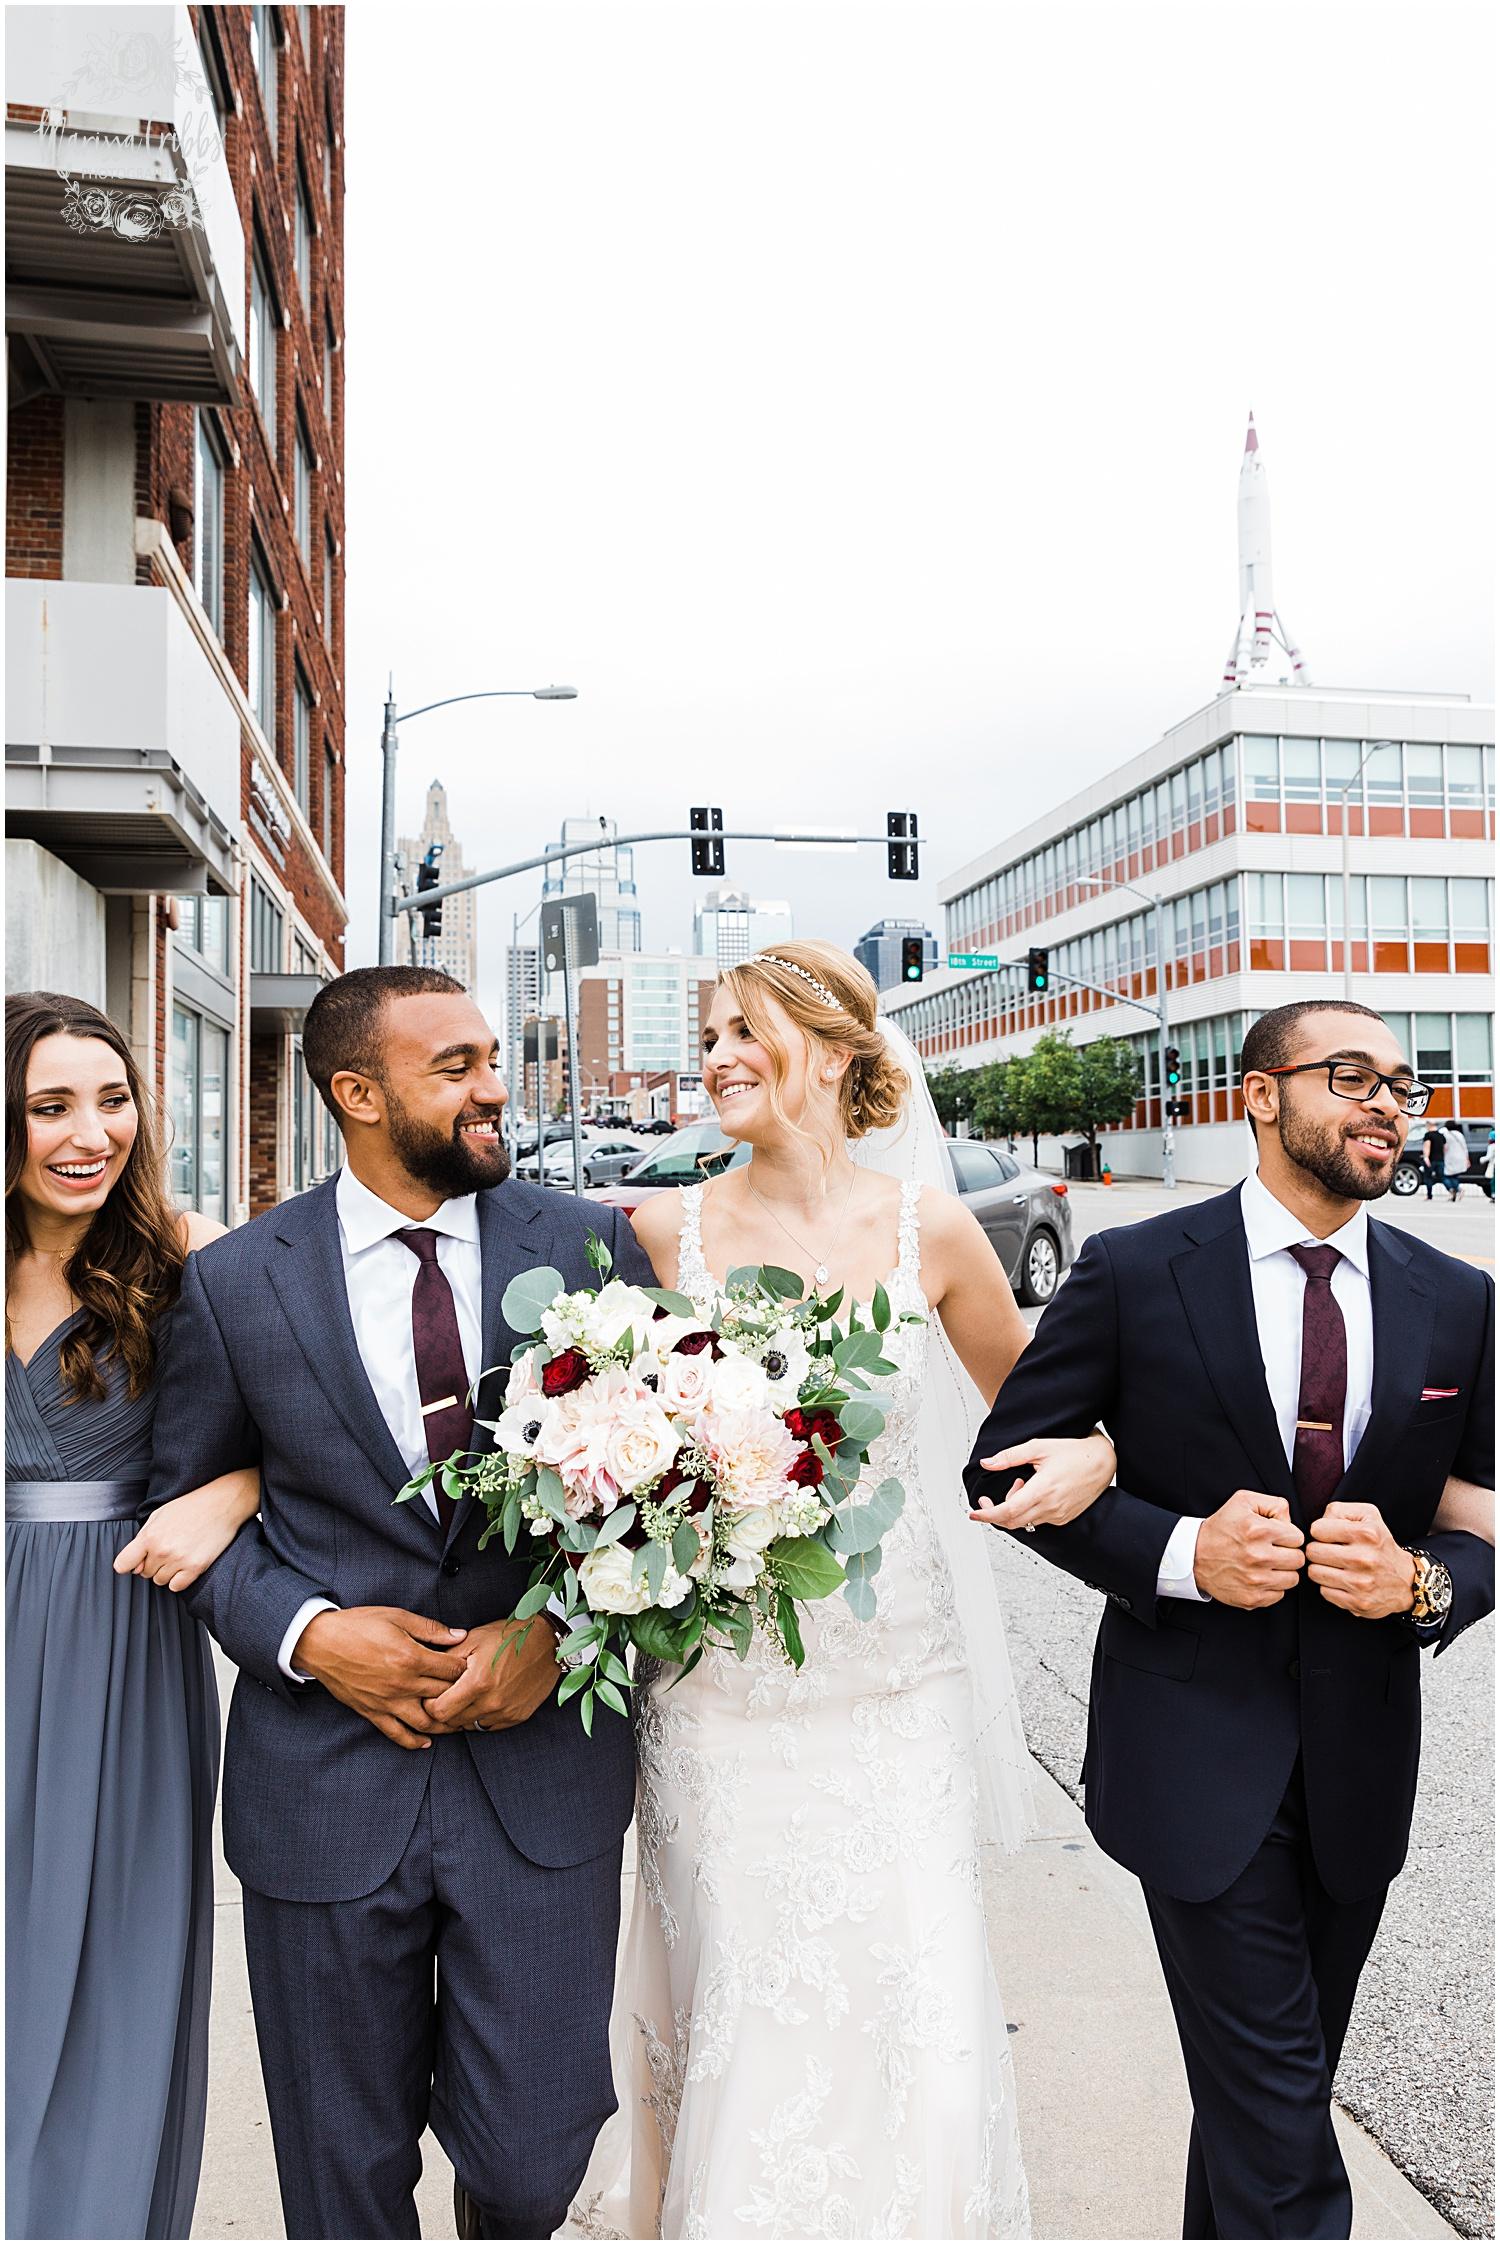 BAUER WEDDING   KELSEA & JUSTIN   MARISSA CRIBBS PHOTOGRAPHY_6528.jpg